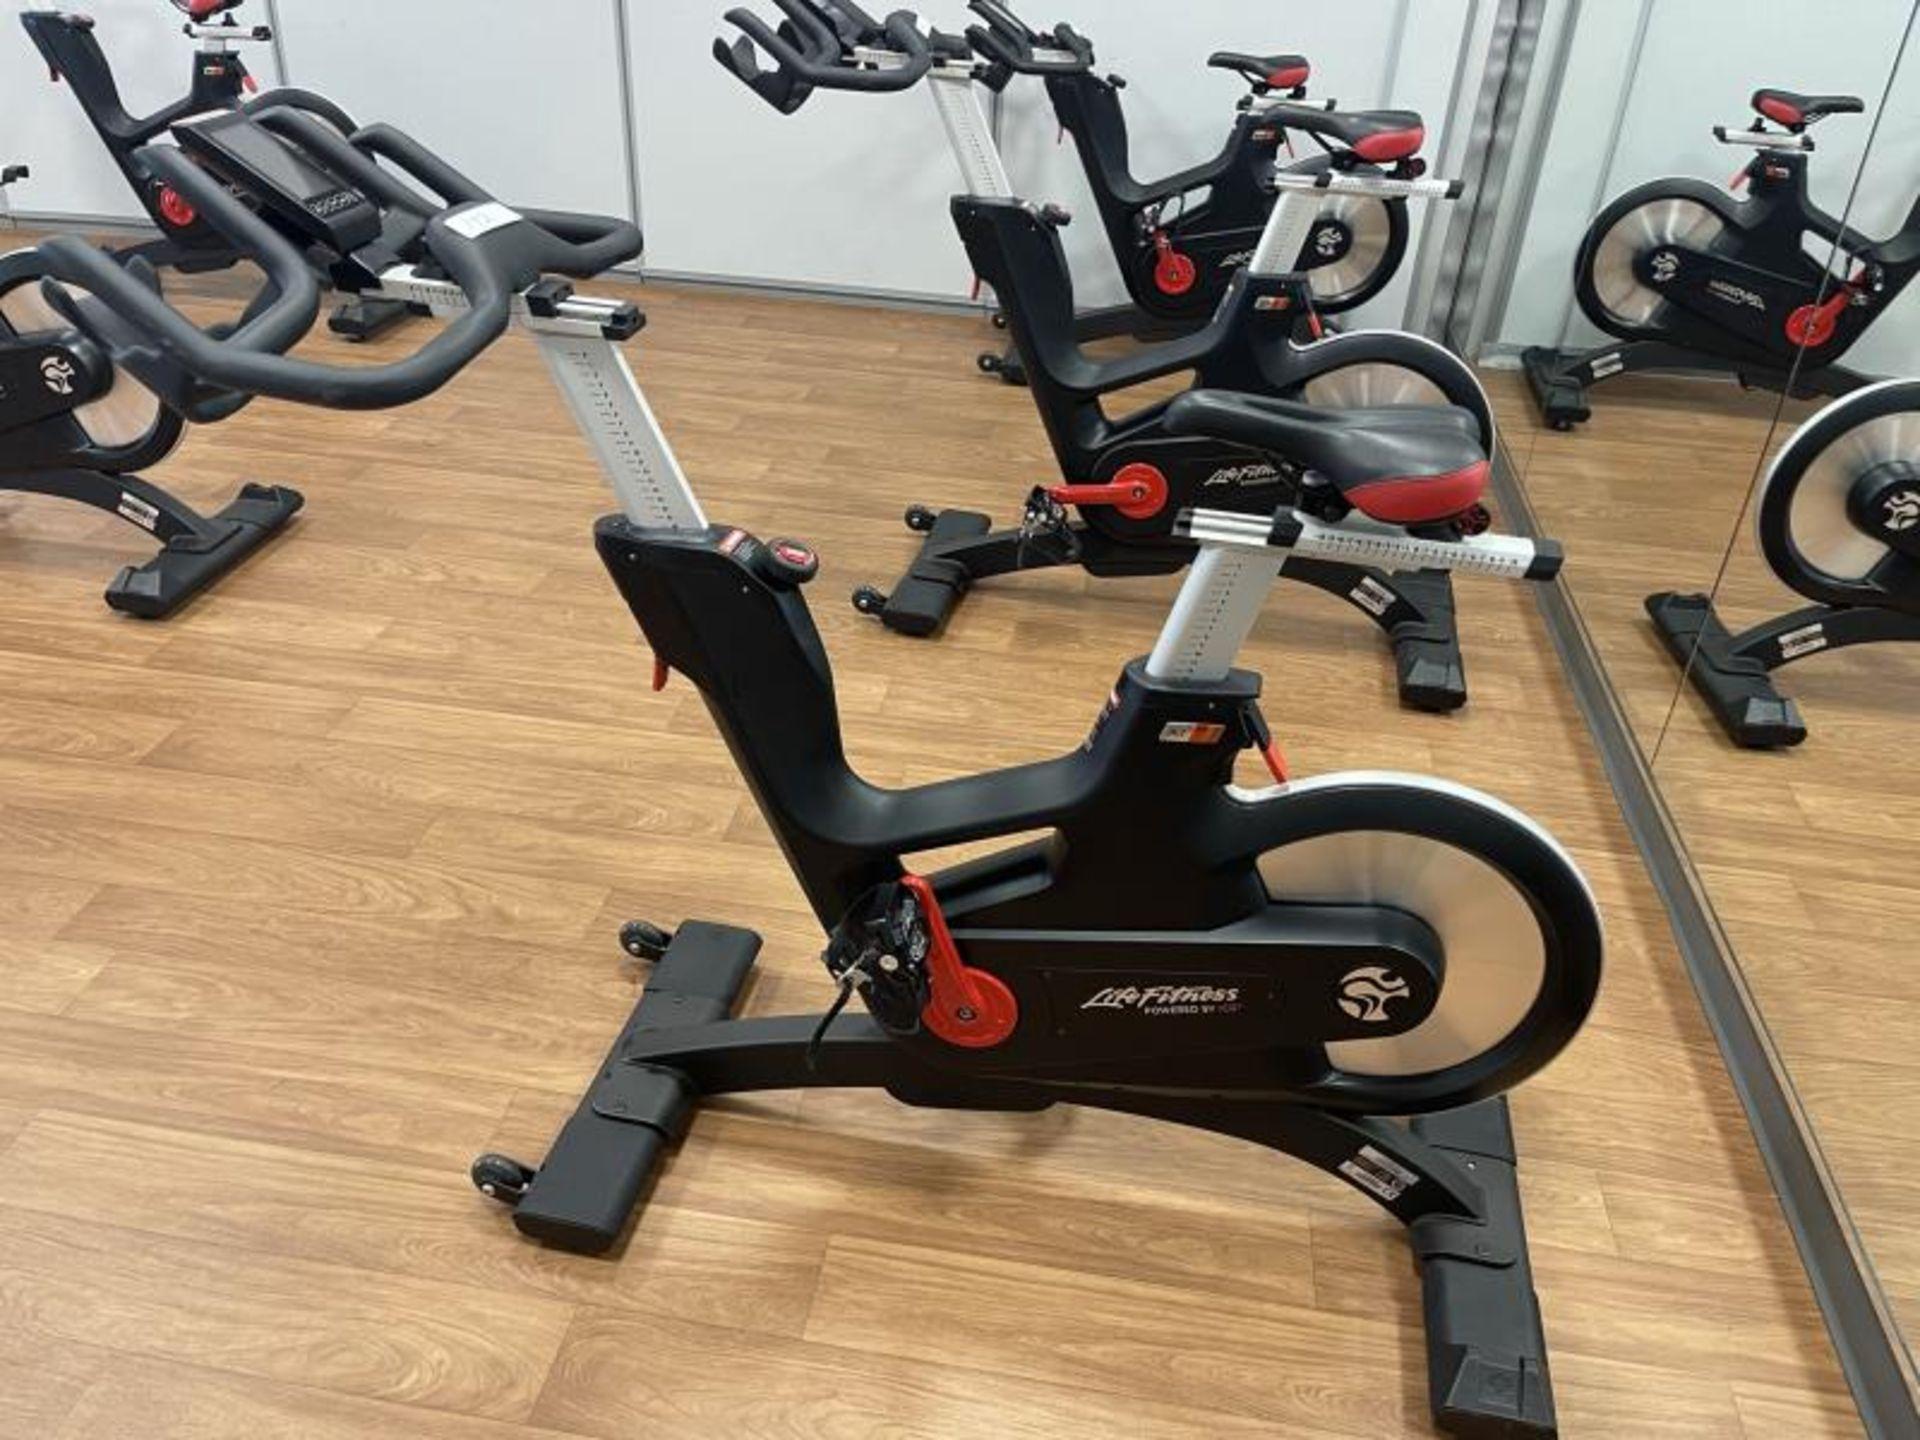 2018 Life Fitness IC7 Spin Bikes M: IC-LFIC7B2-01